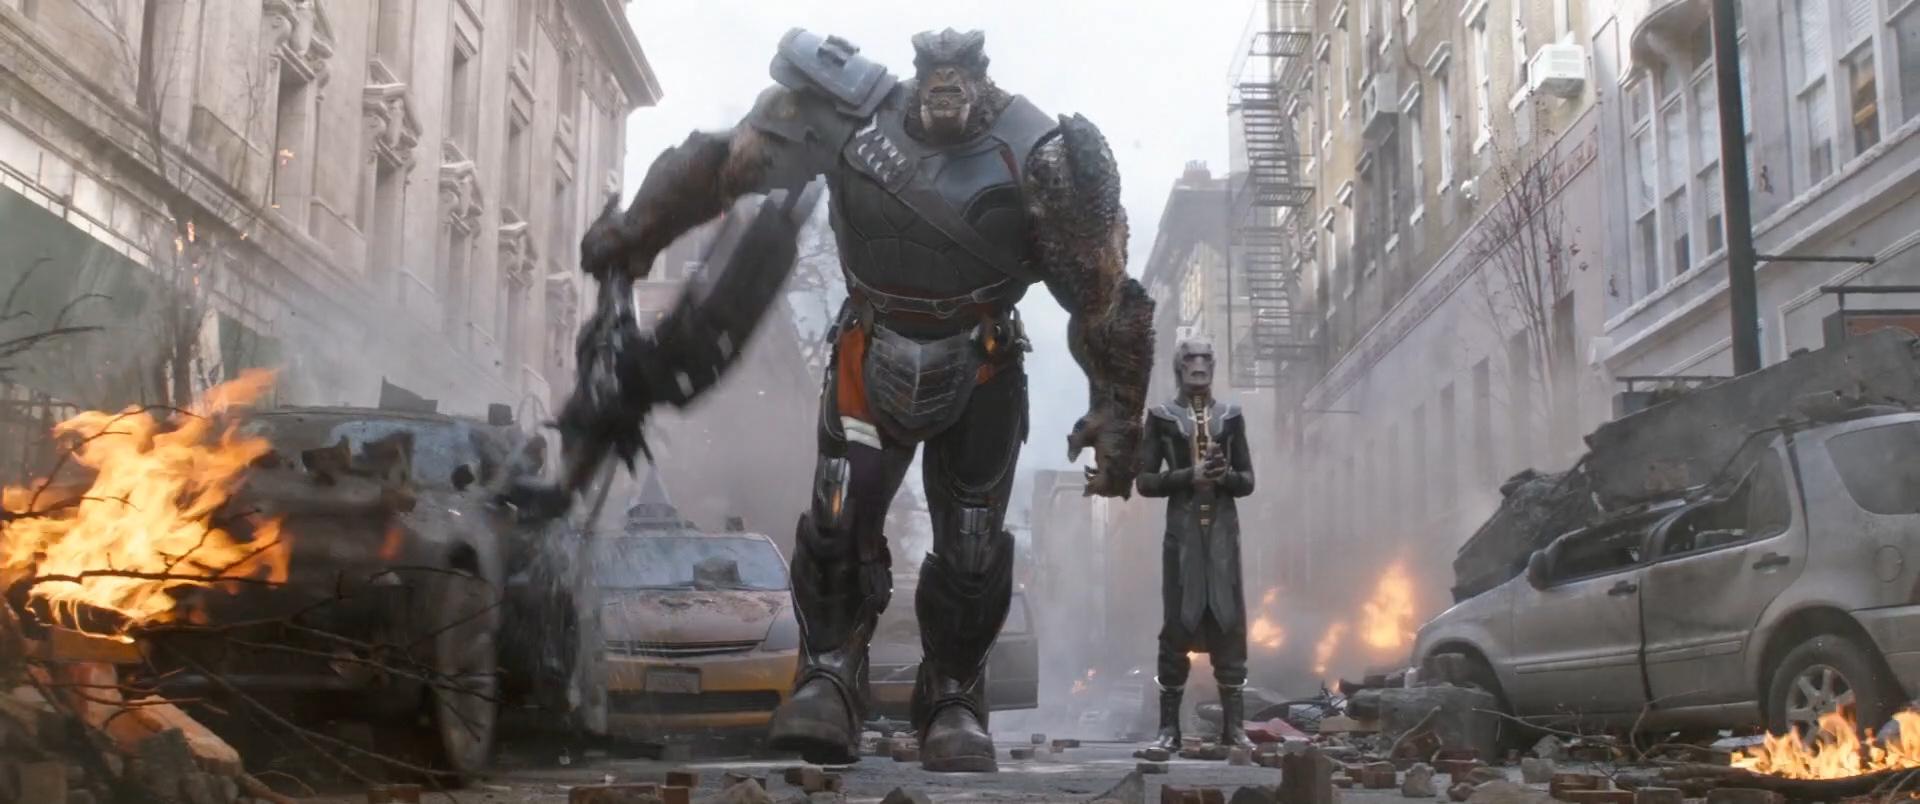 avengers__infinity_war.mp4_.00_20_24_19.still002.jpg